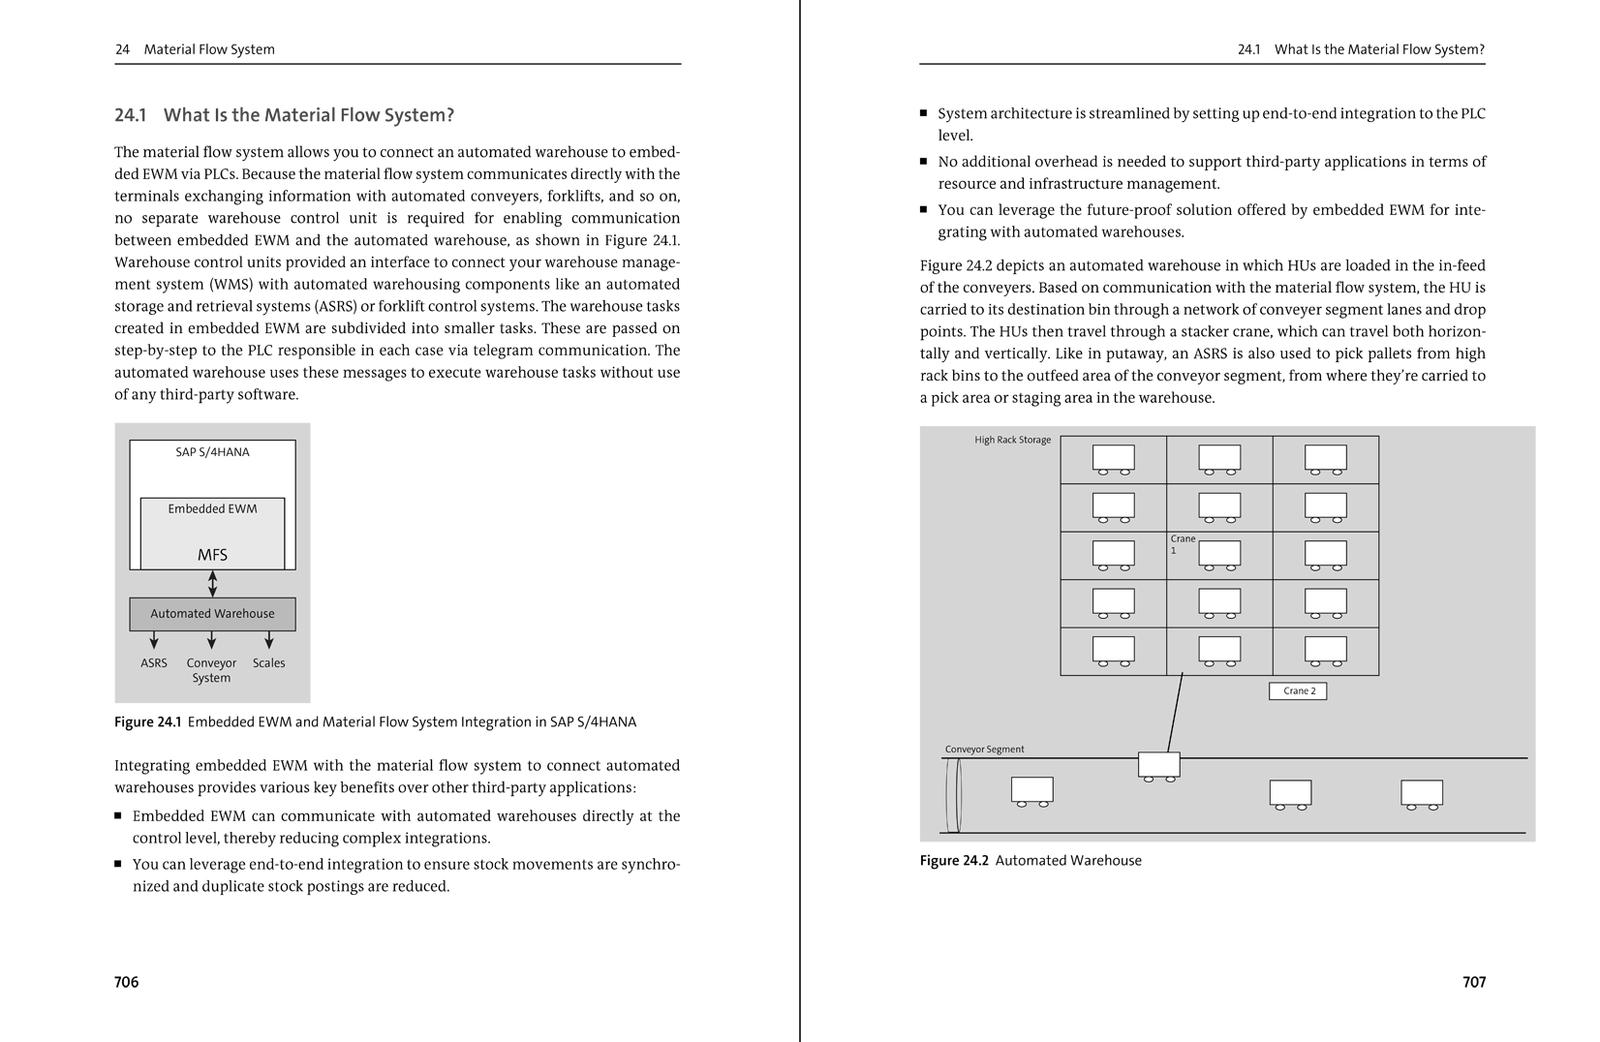 Warehouse Management in SAP S/4HANA - Embedded EWM